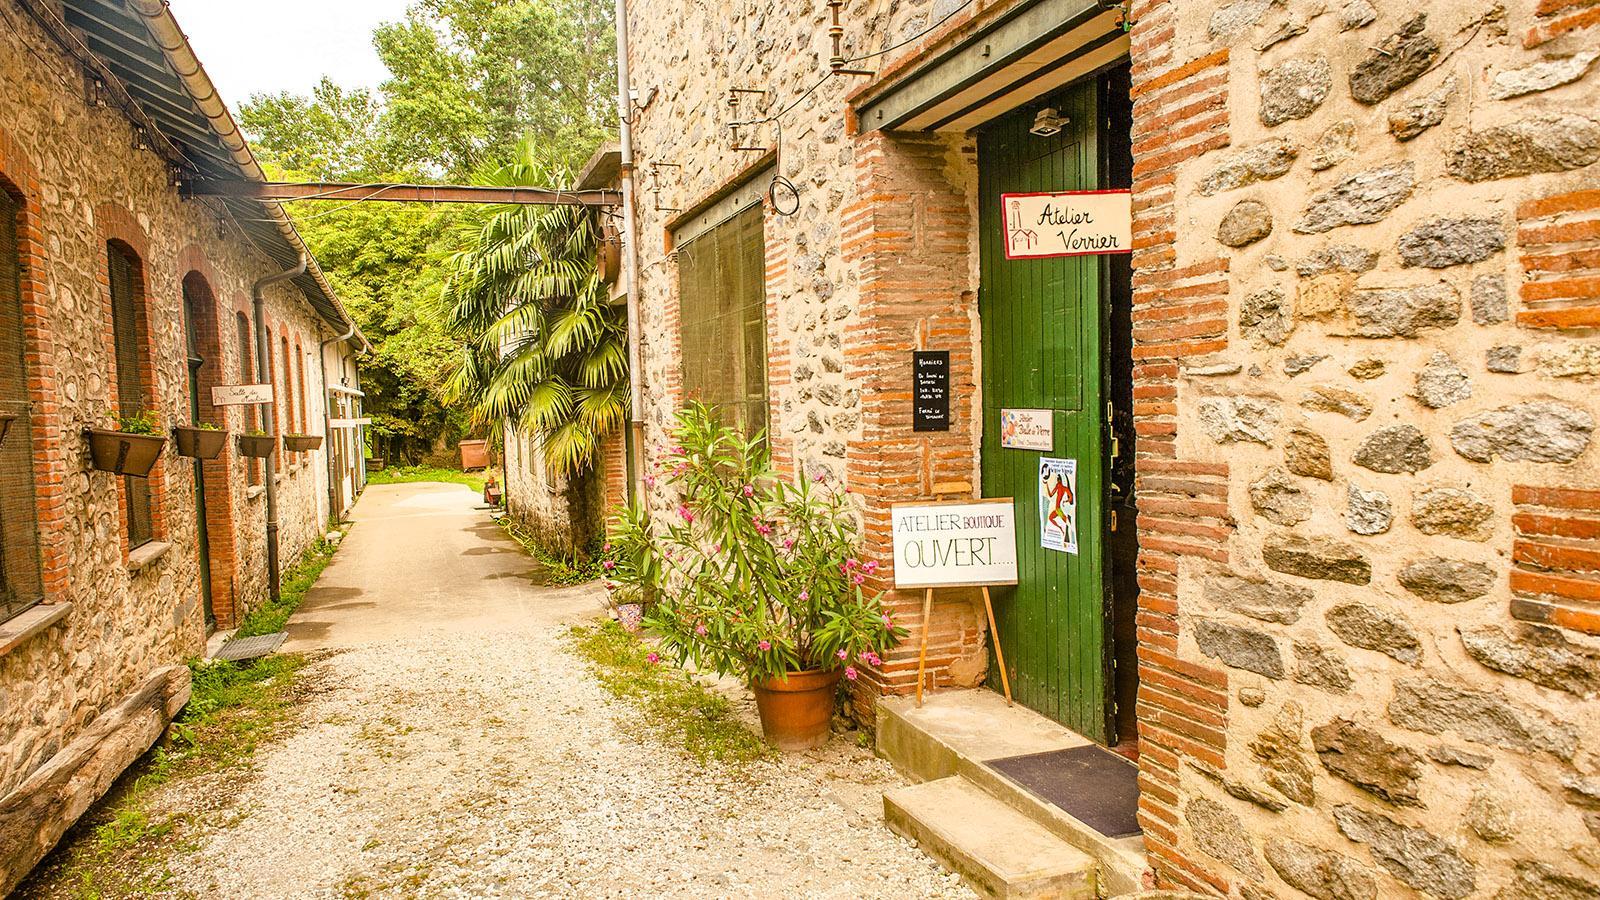 Arles-sur-Tech: Der Weg zur den Wegstätten in der alten Fabrik. Foto: Hilke Maunder